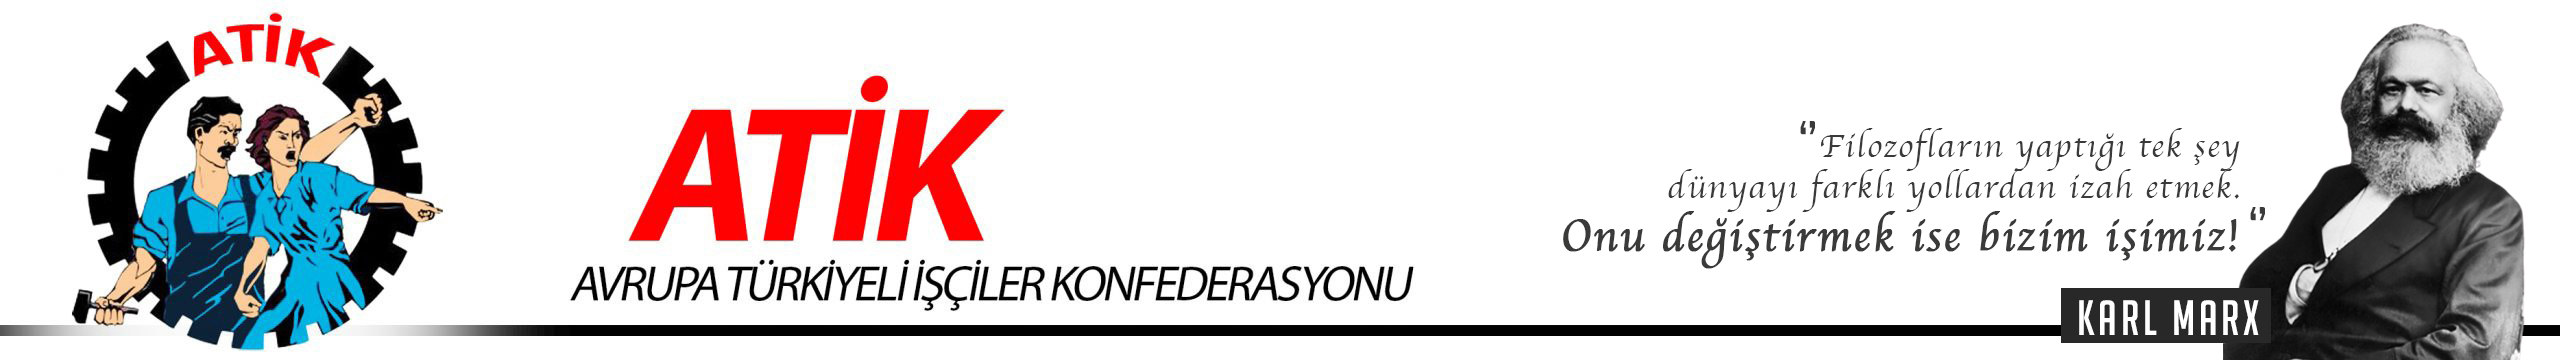 ATİK Online